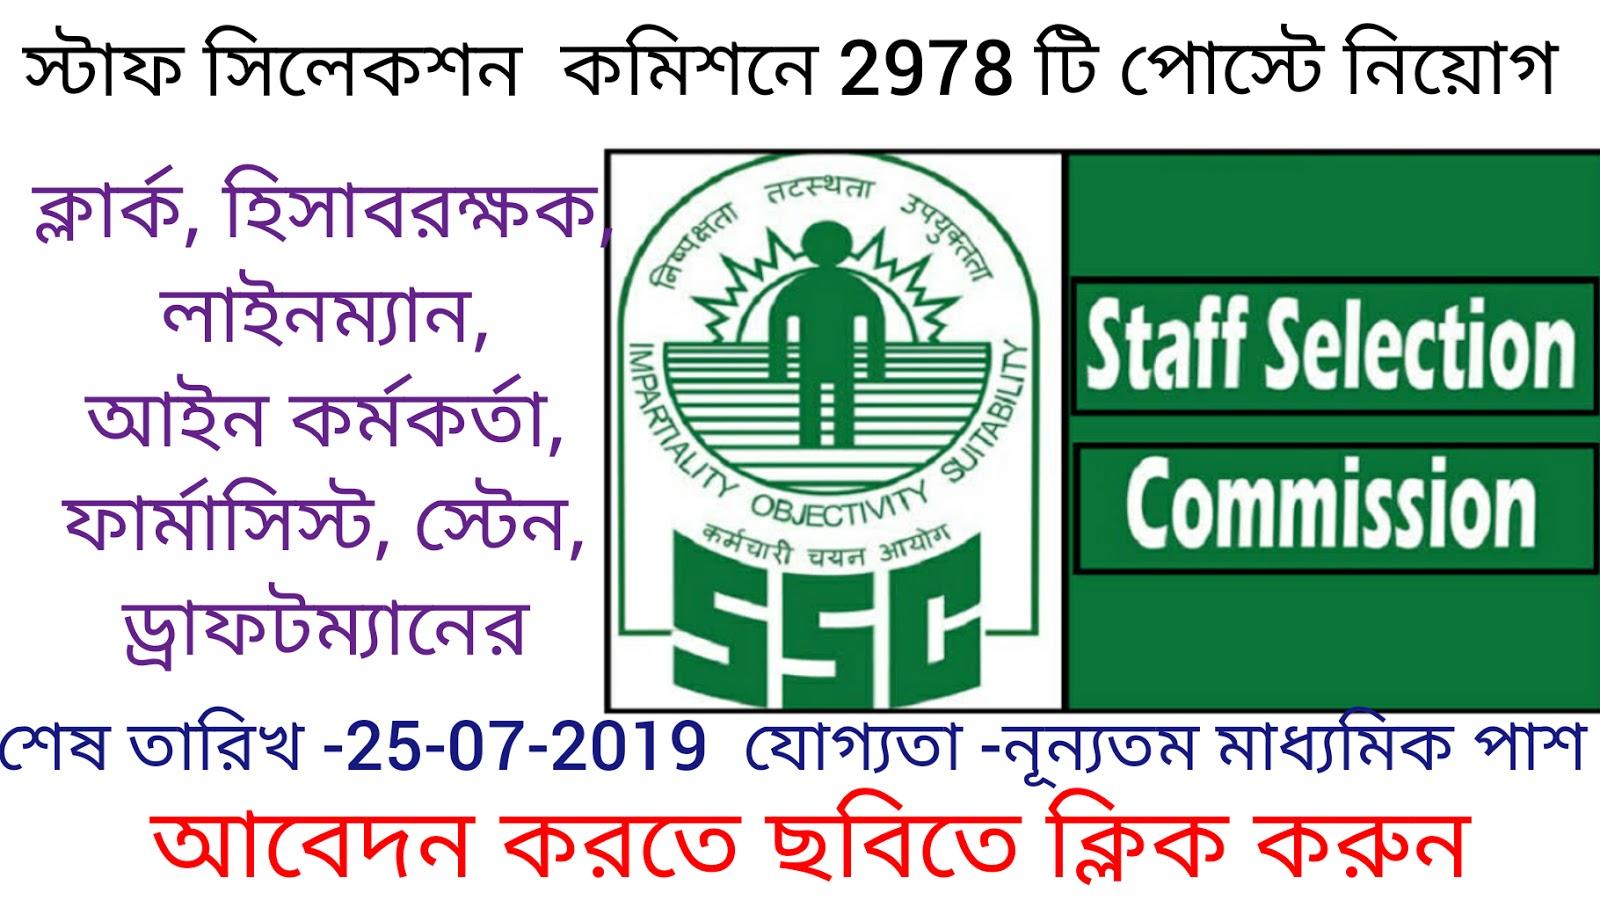 https://www.chakrirbazar.in/2019/07/hariyana-staff-selection-commission.html